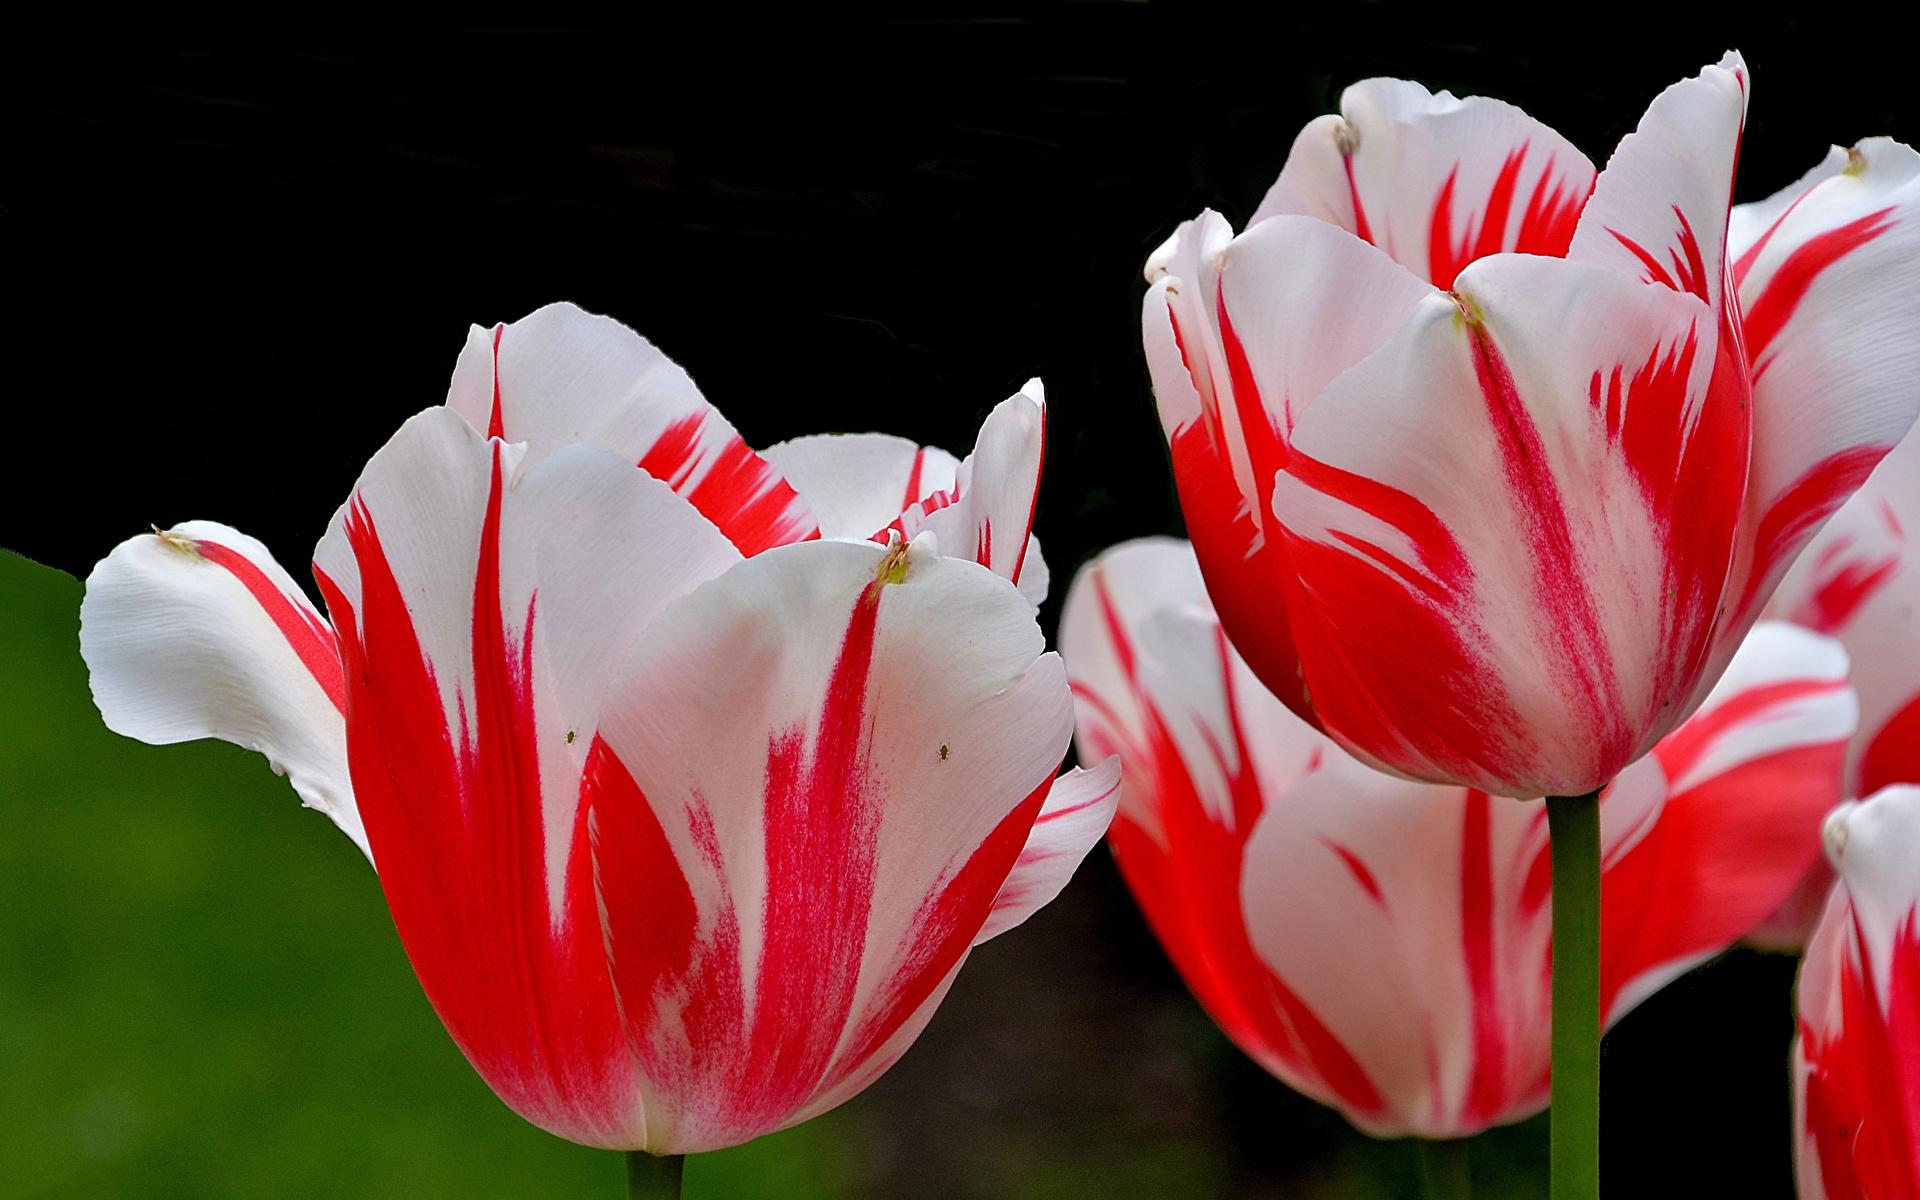 https://s1.1zoom.ru/b5050/579/Tulips_Closeup_459145_1920x1200.jpg